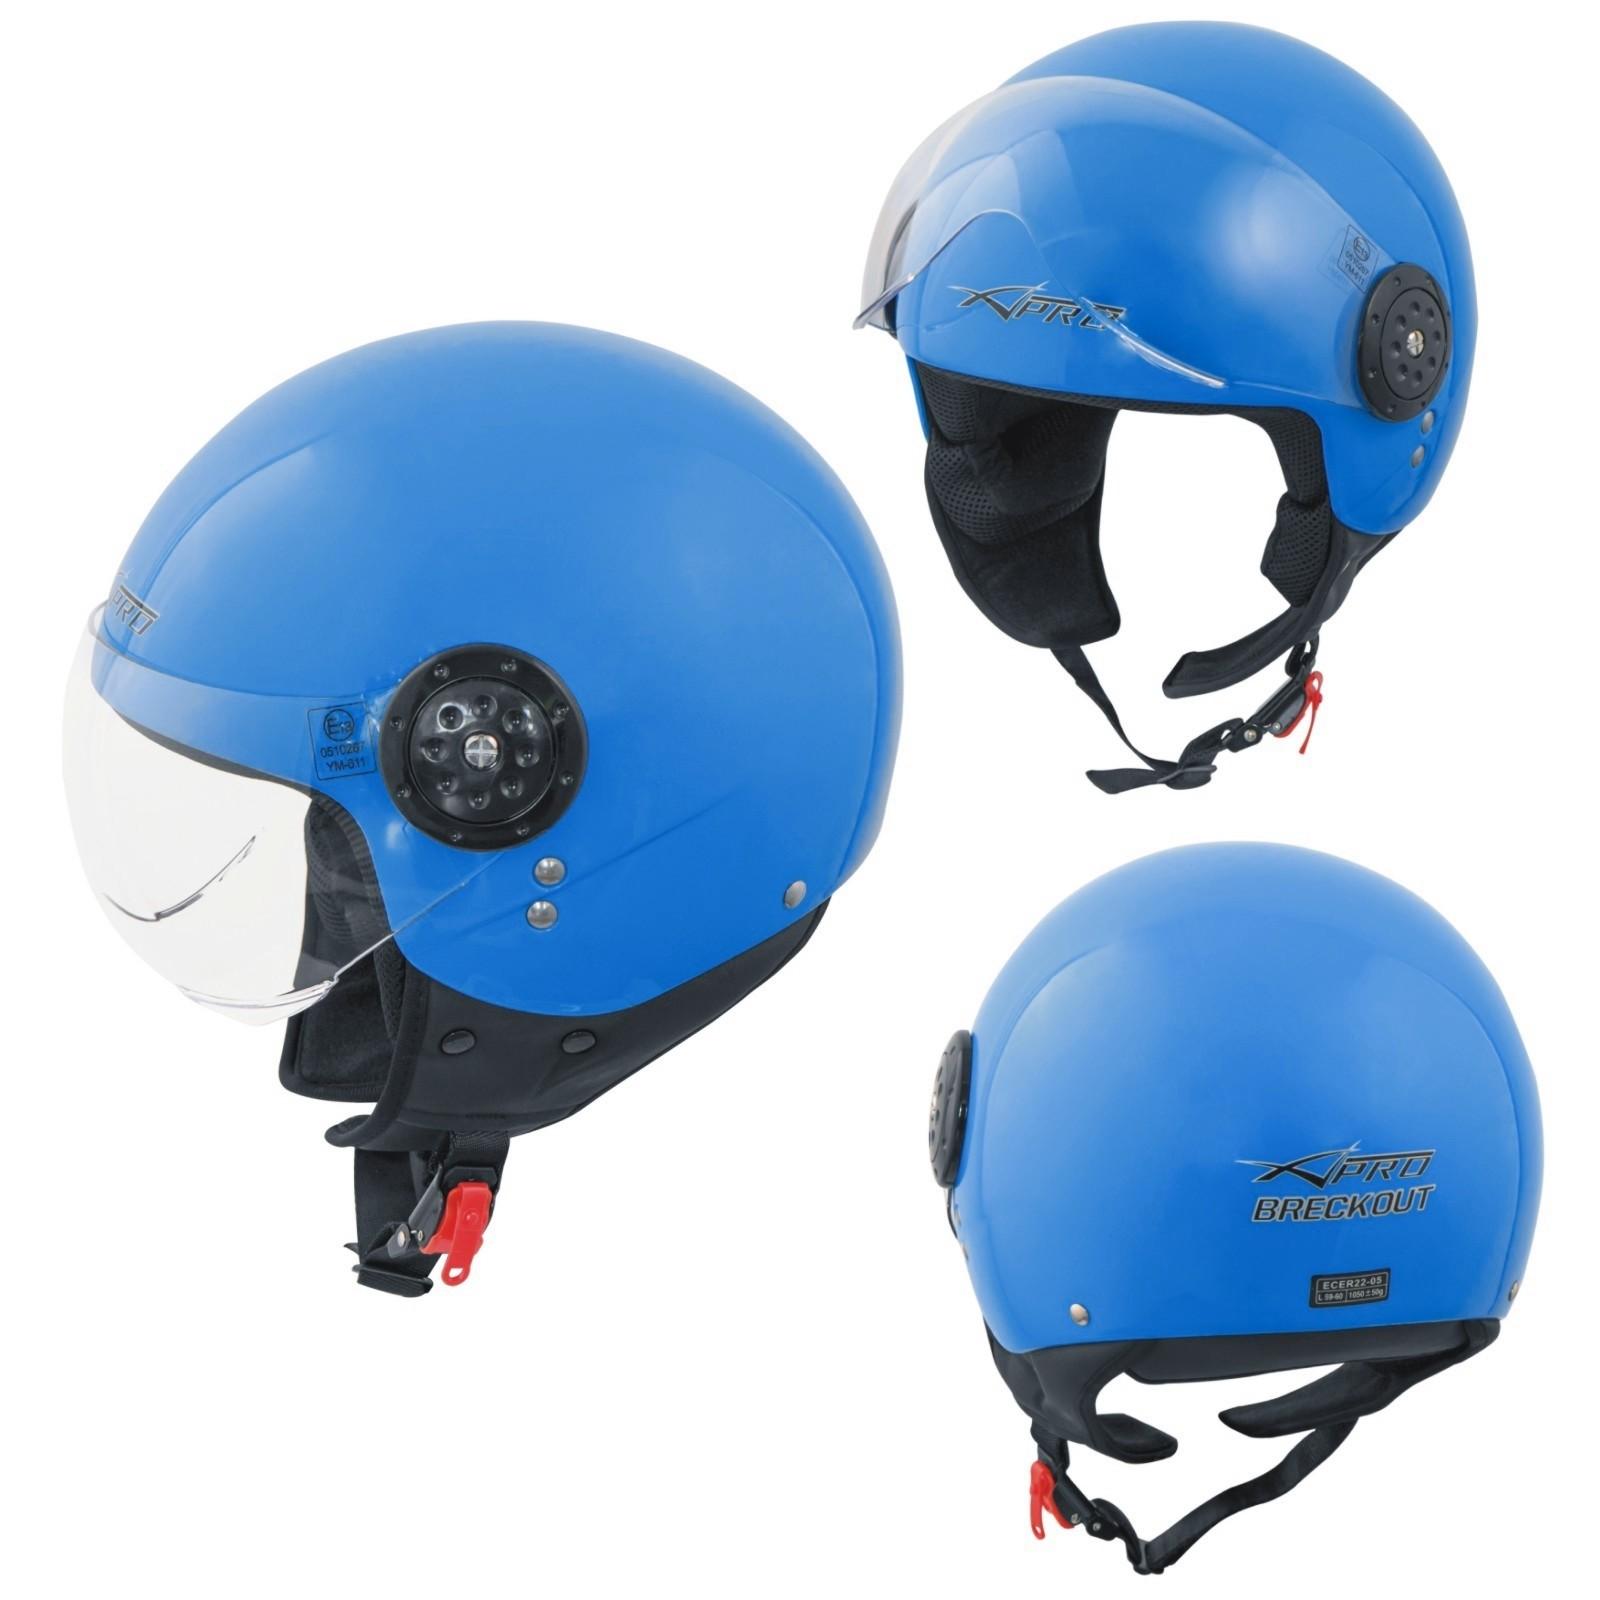 Jet Helmet Fever A-Pro Casco Green Sonicmotoshop